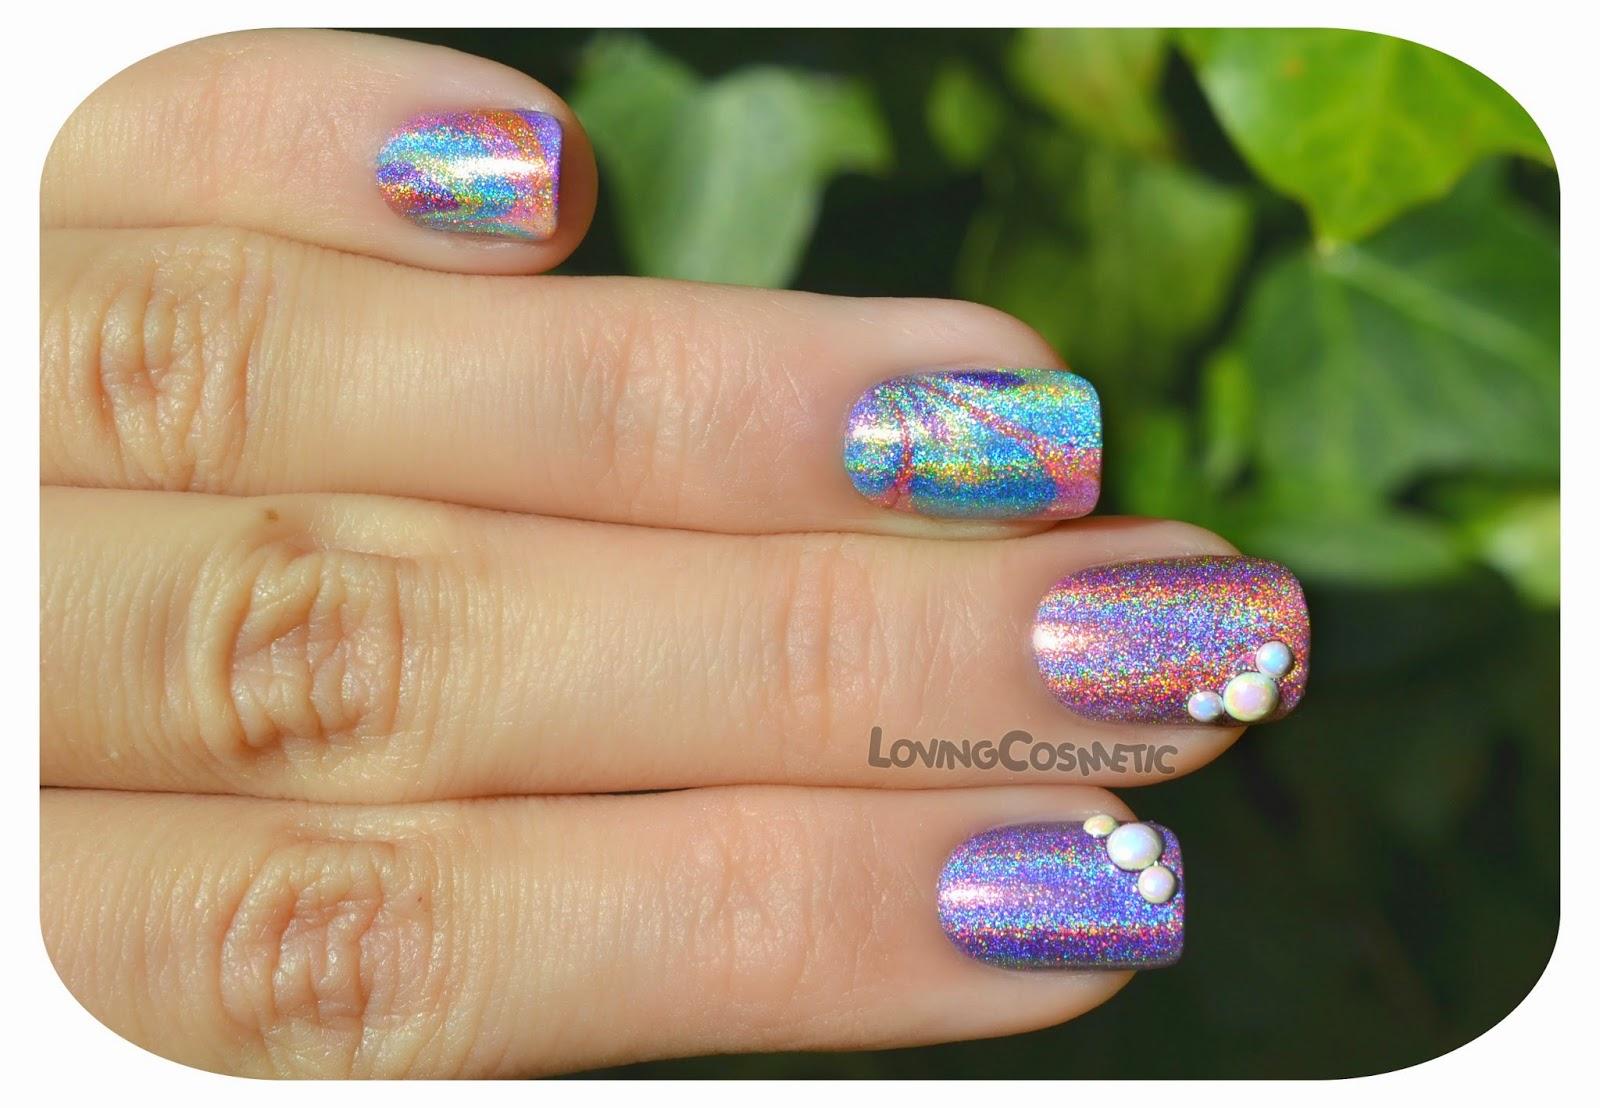 LovingCosmetic Holografico Color Club Water Marble bornprettyStore nails nailart nai art uñas primavera verano 2015